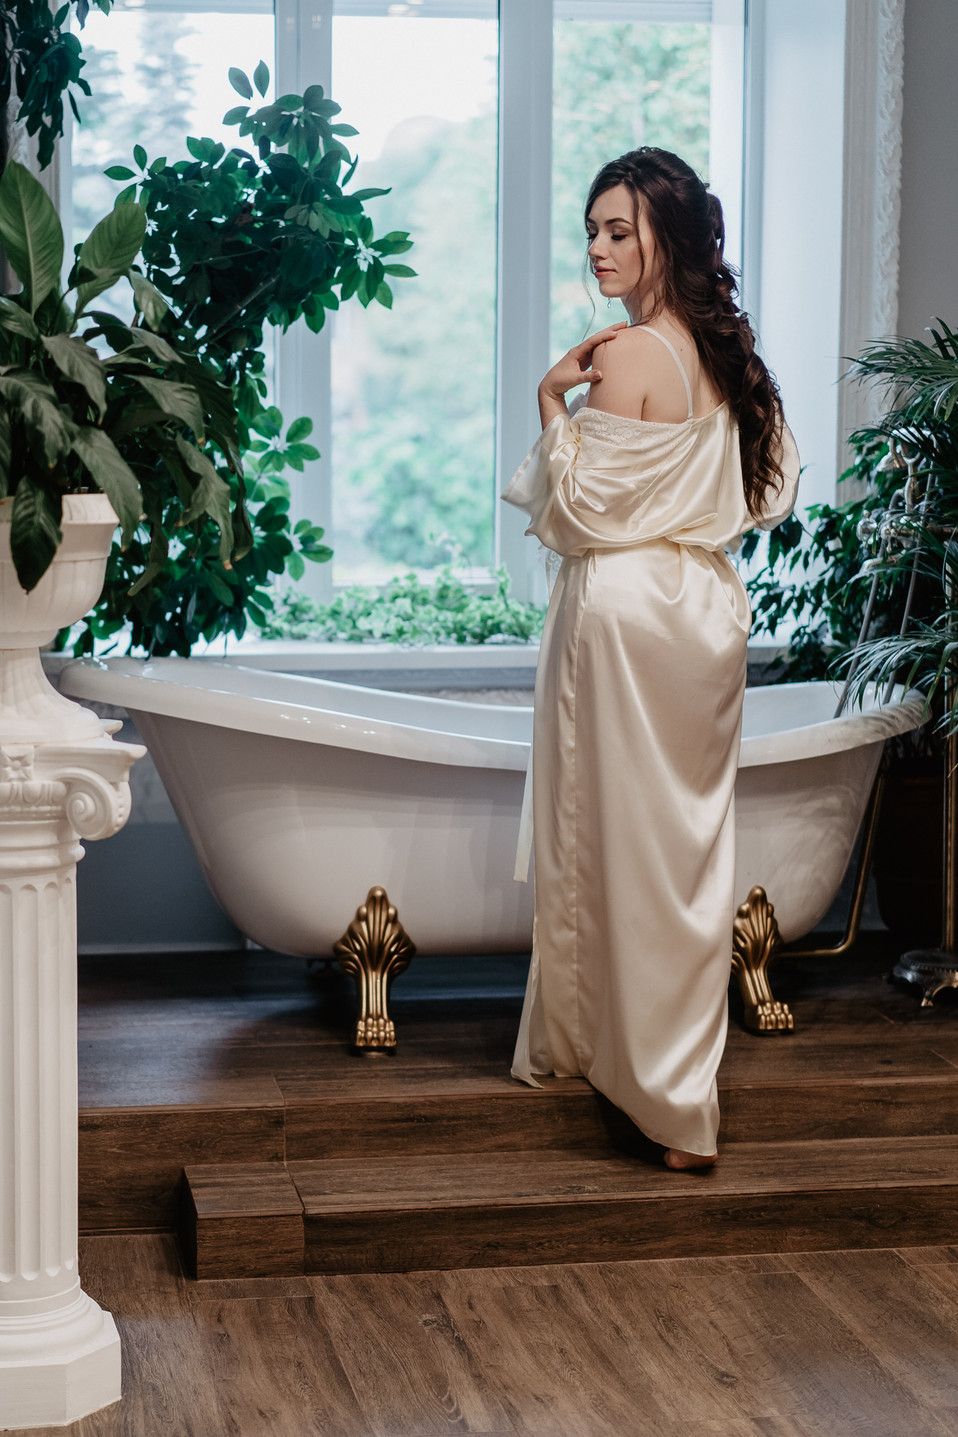 ArtSoul_Wedding_anons-2.jpg